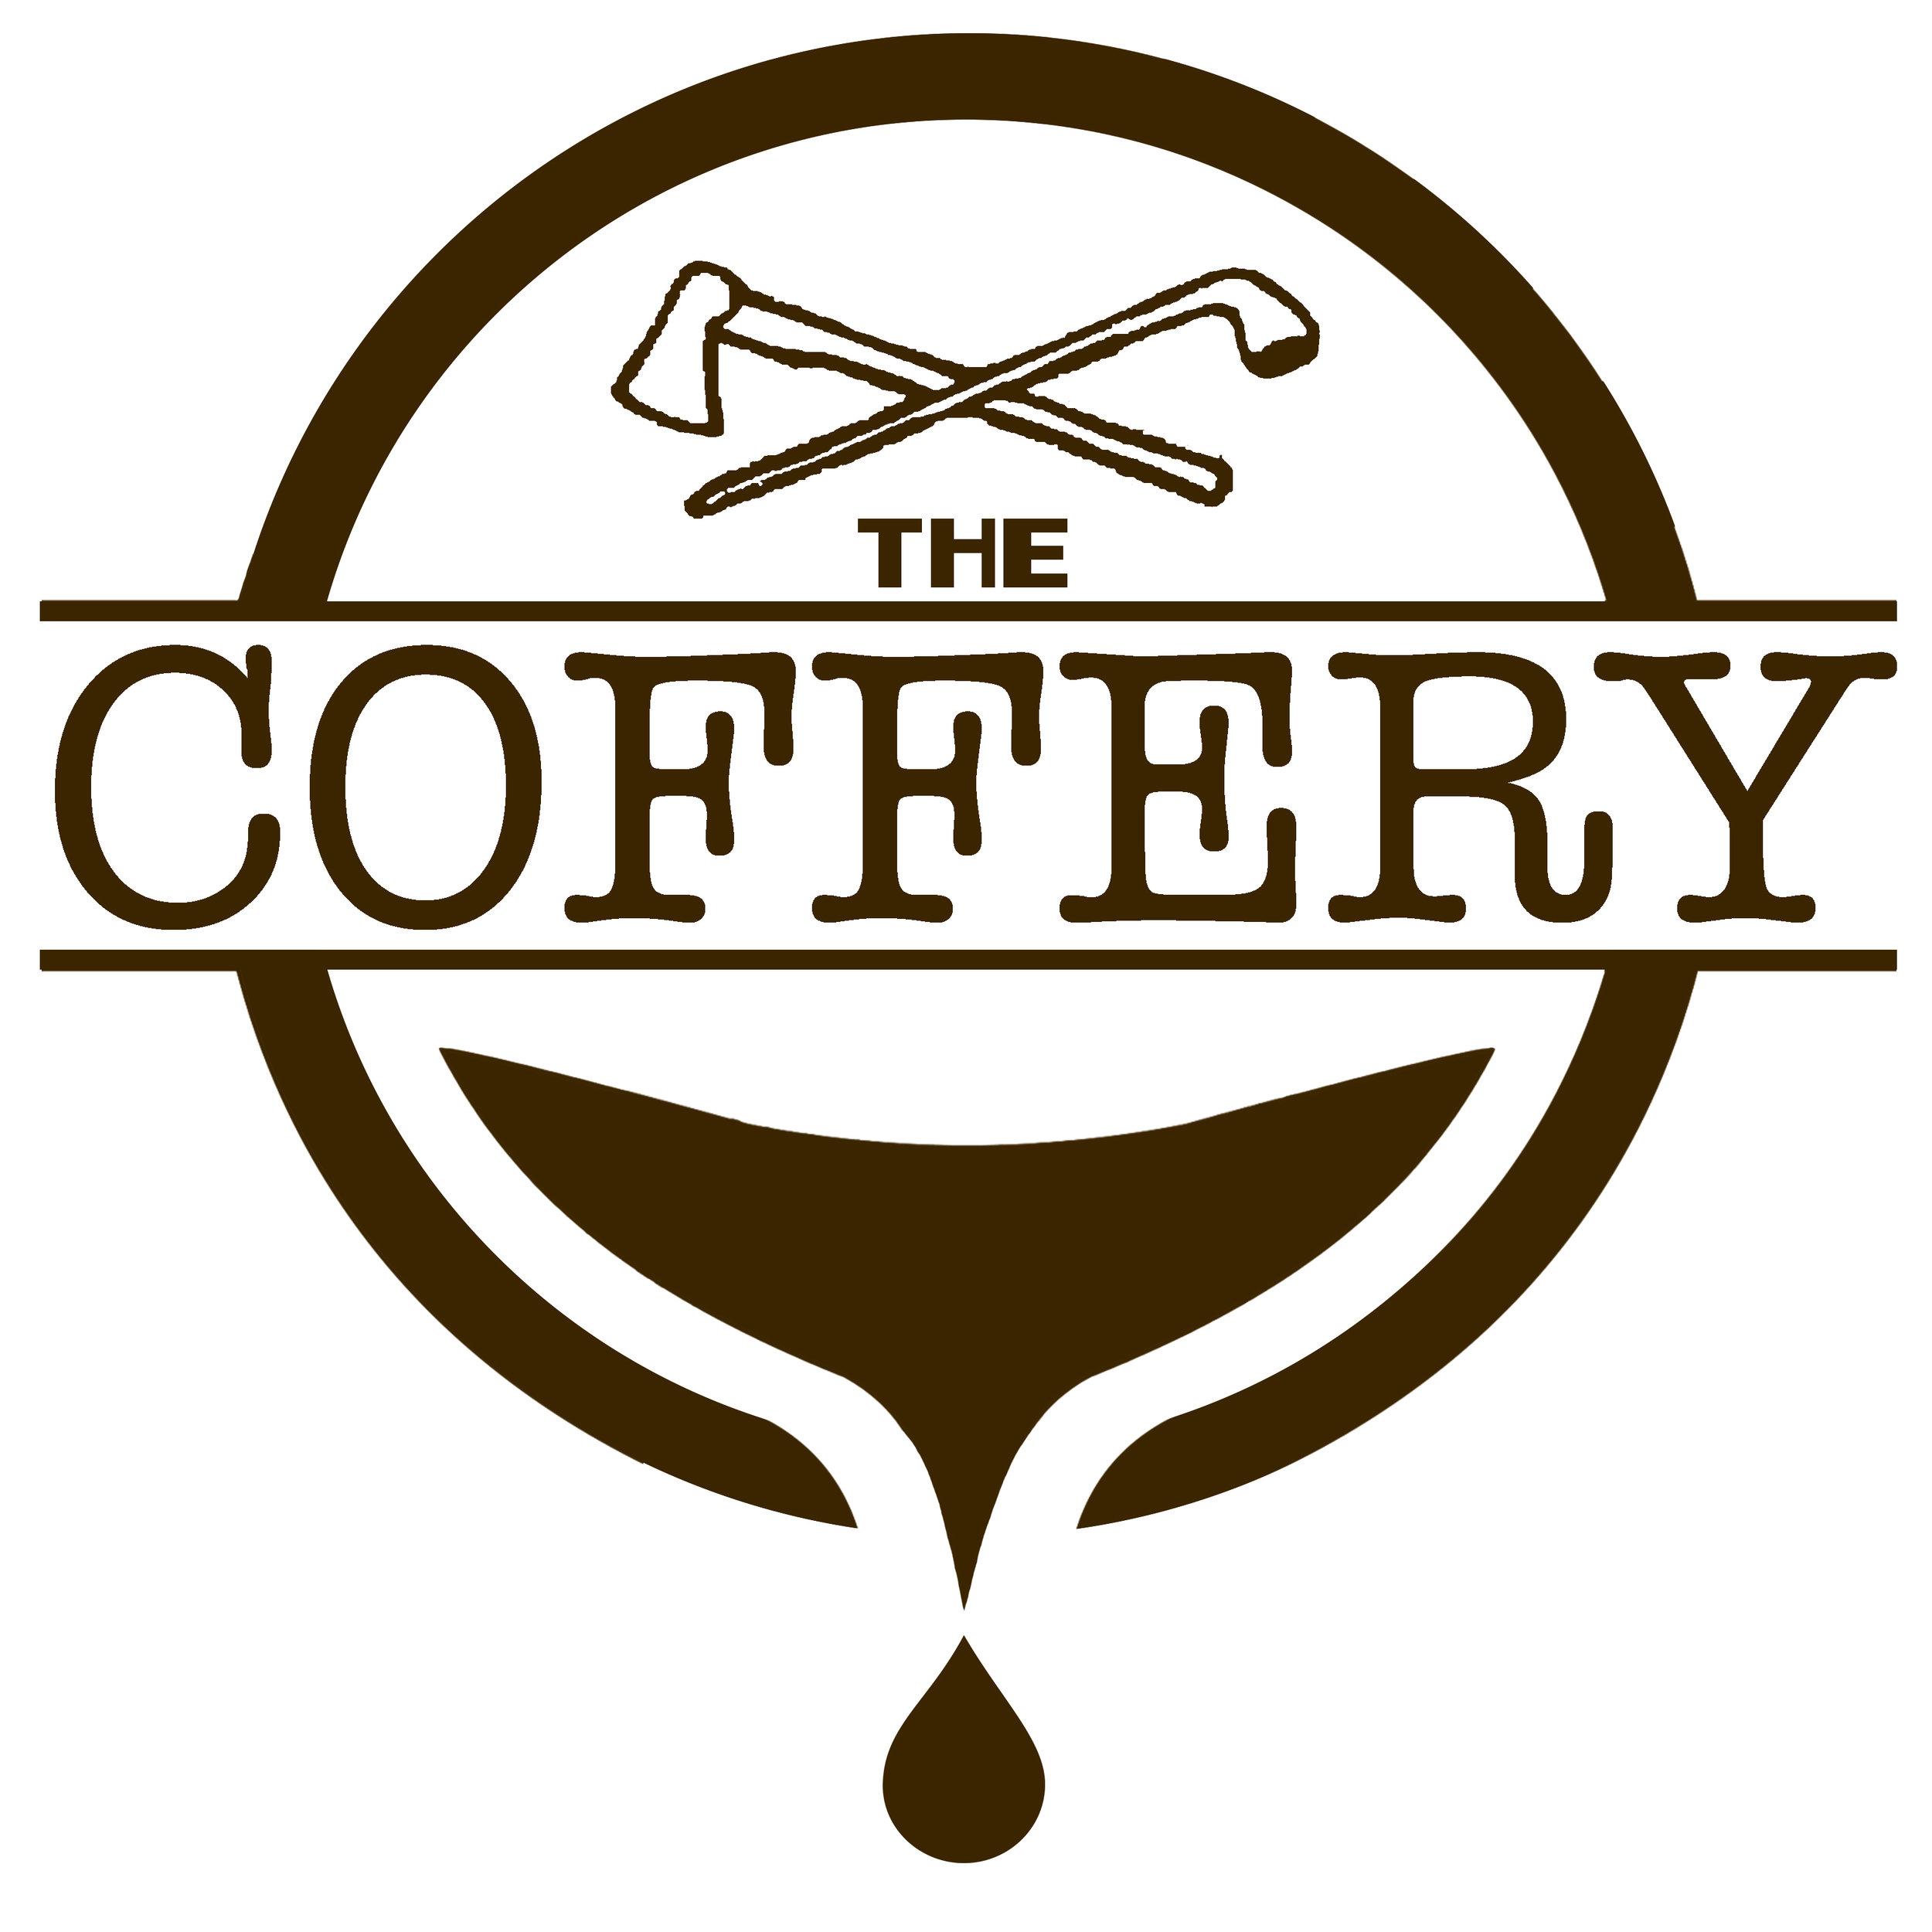 Coffery1.jpg